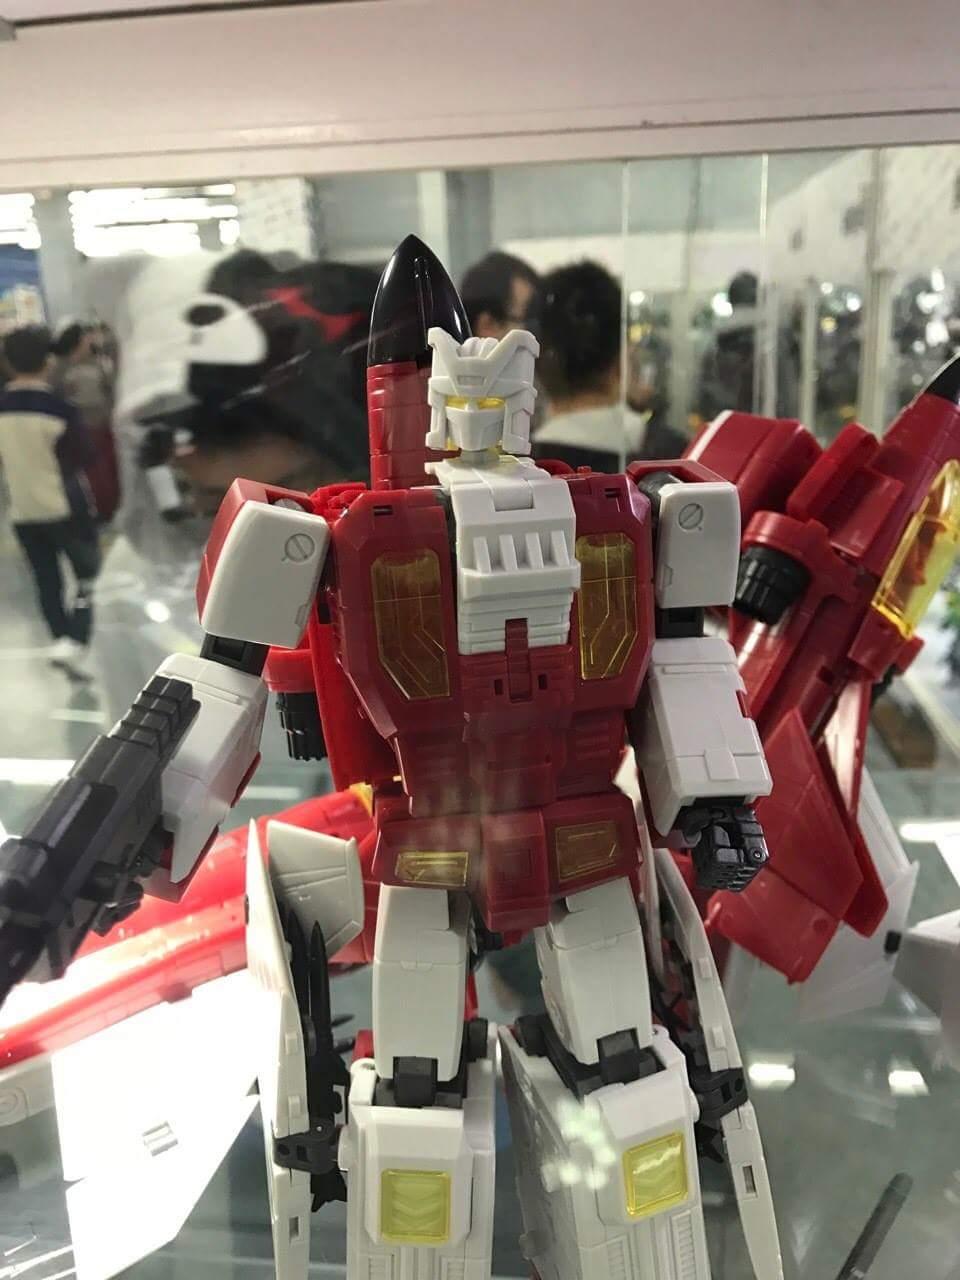 [Zeta Toys] Produit Tiers - Jouets ZB Kronos (ZB-01 à ZB-05) - aka Superion YGB5wks5